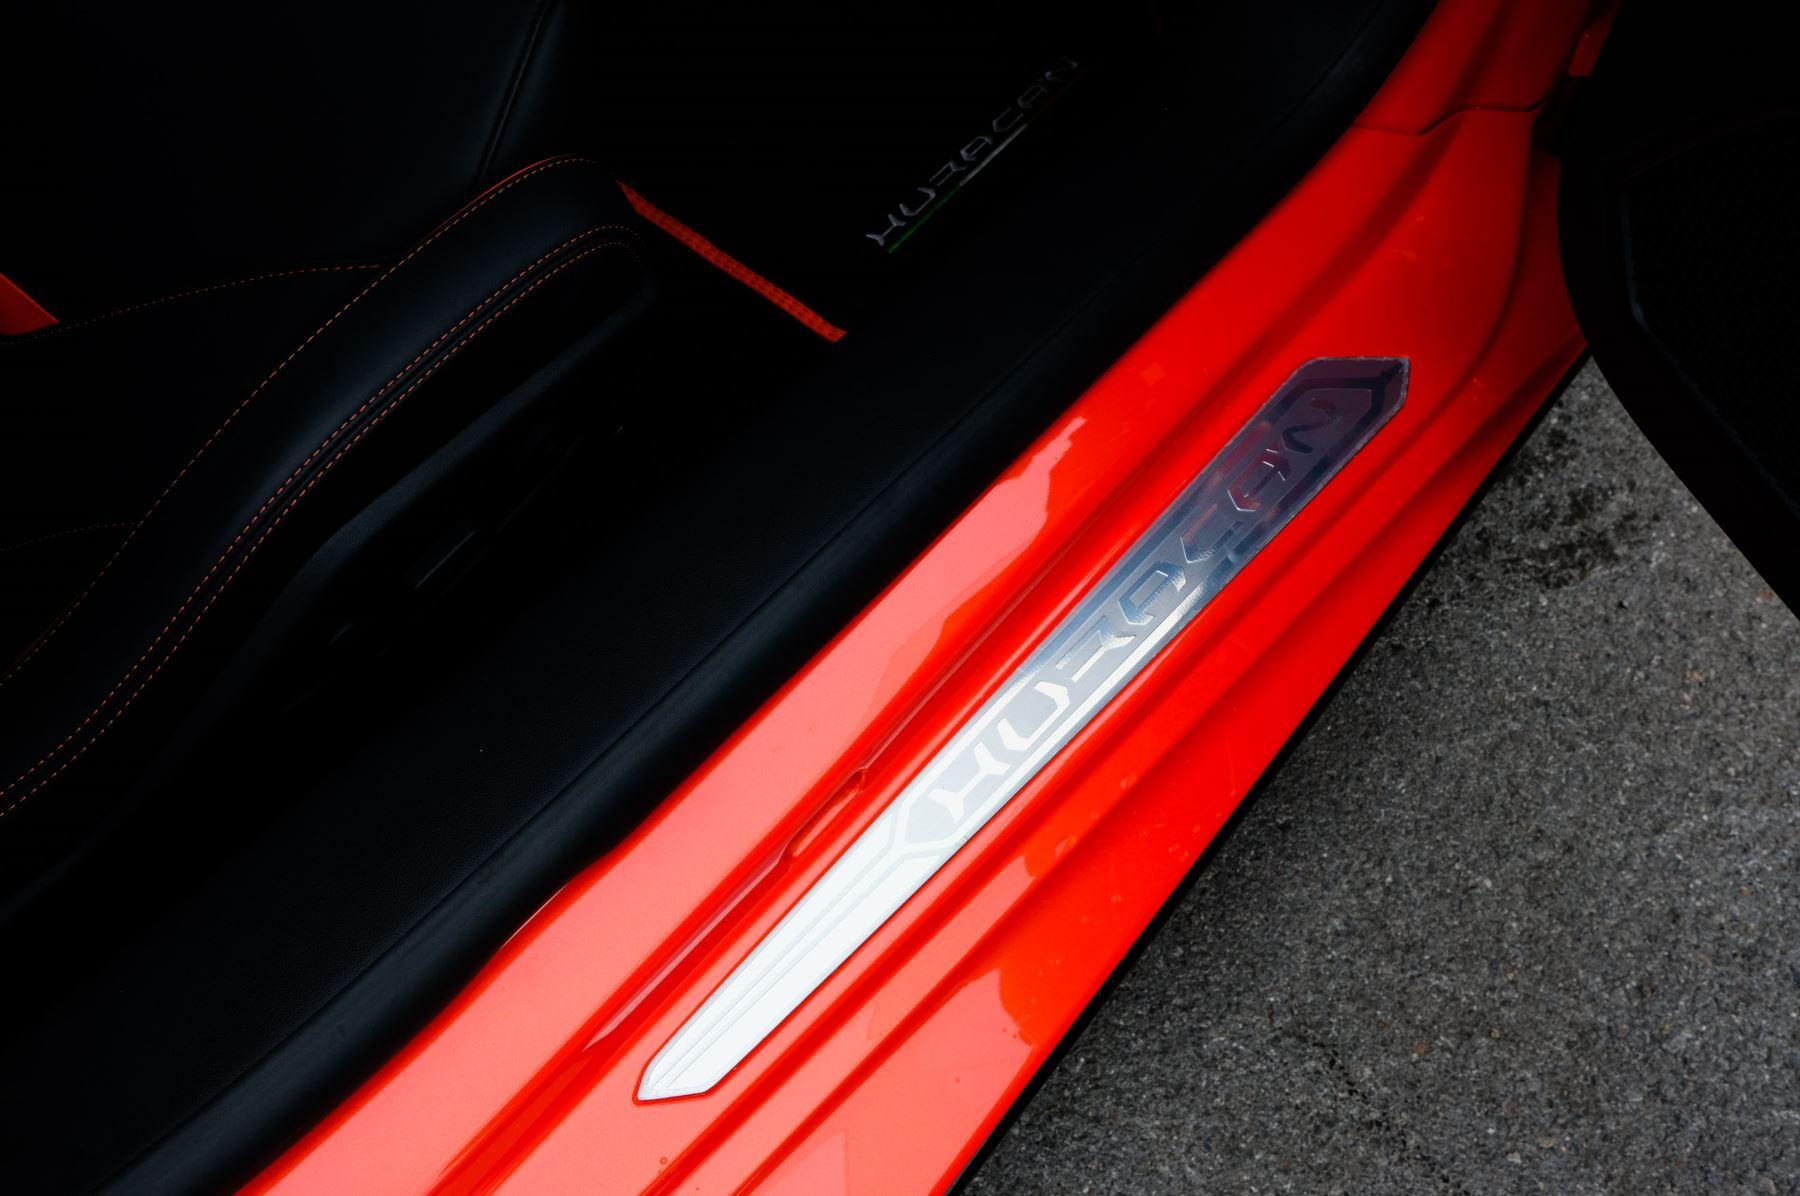 Lamborghini Huracan EVO LP 640-4 LDF image 15